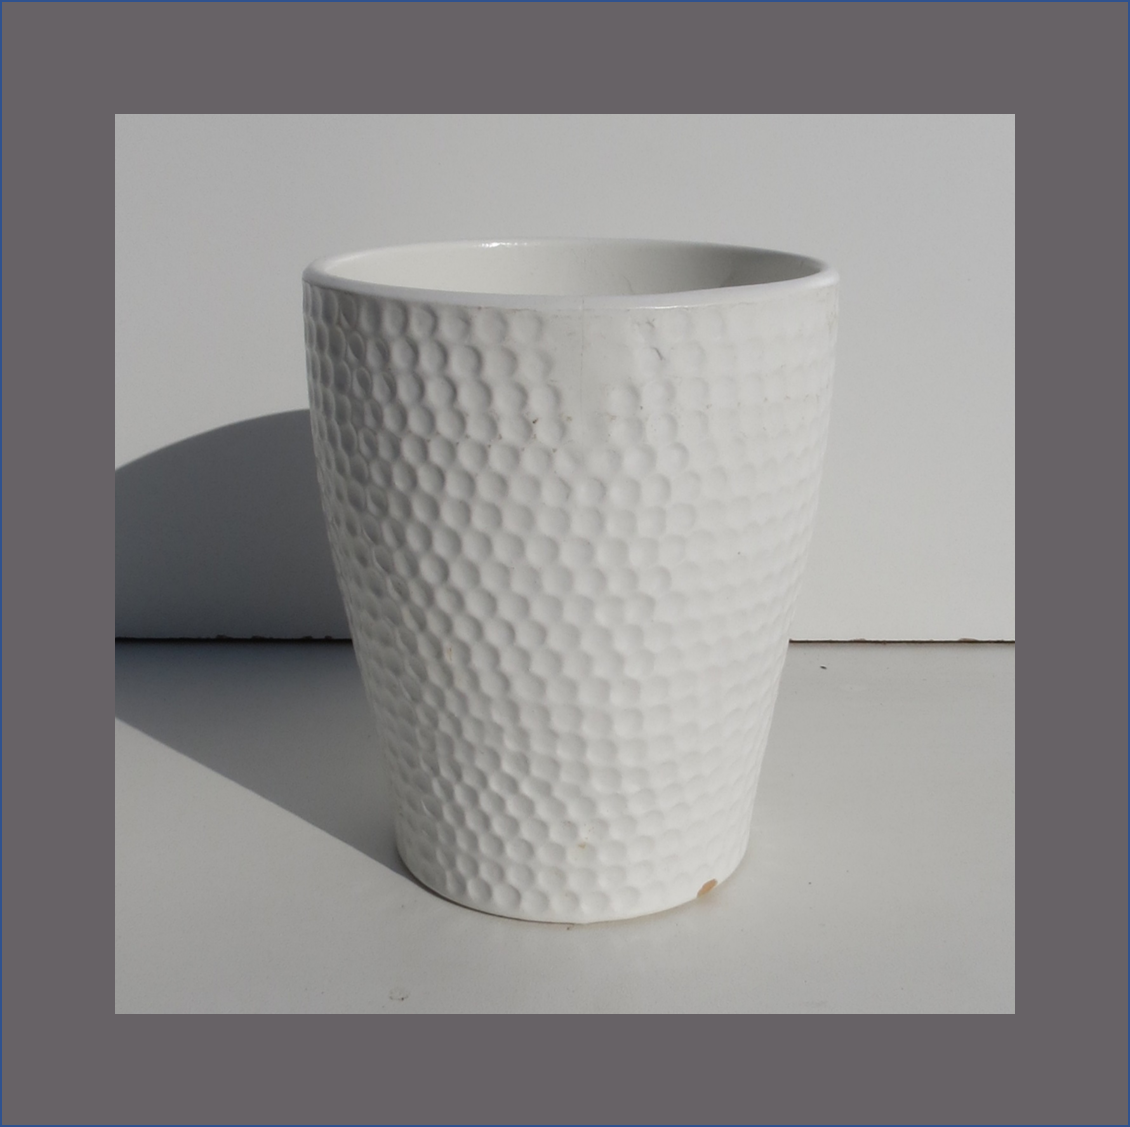 dimple-vase-white